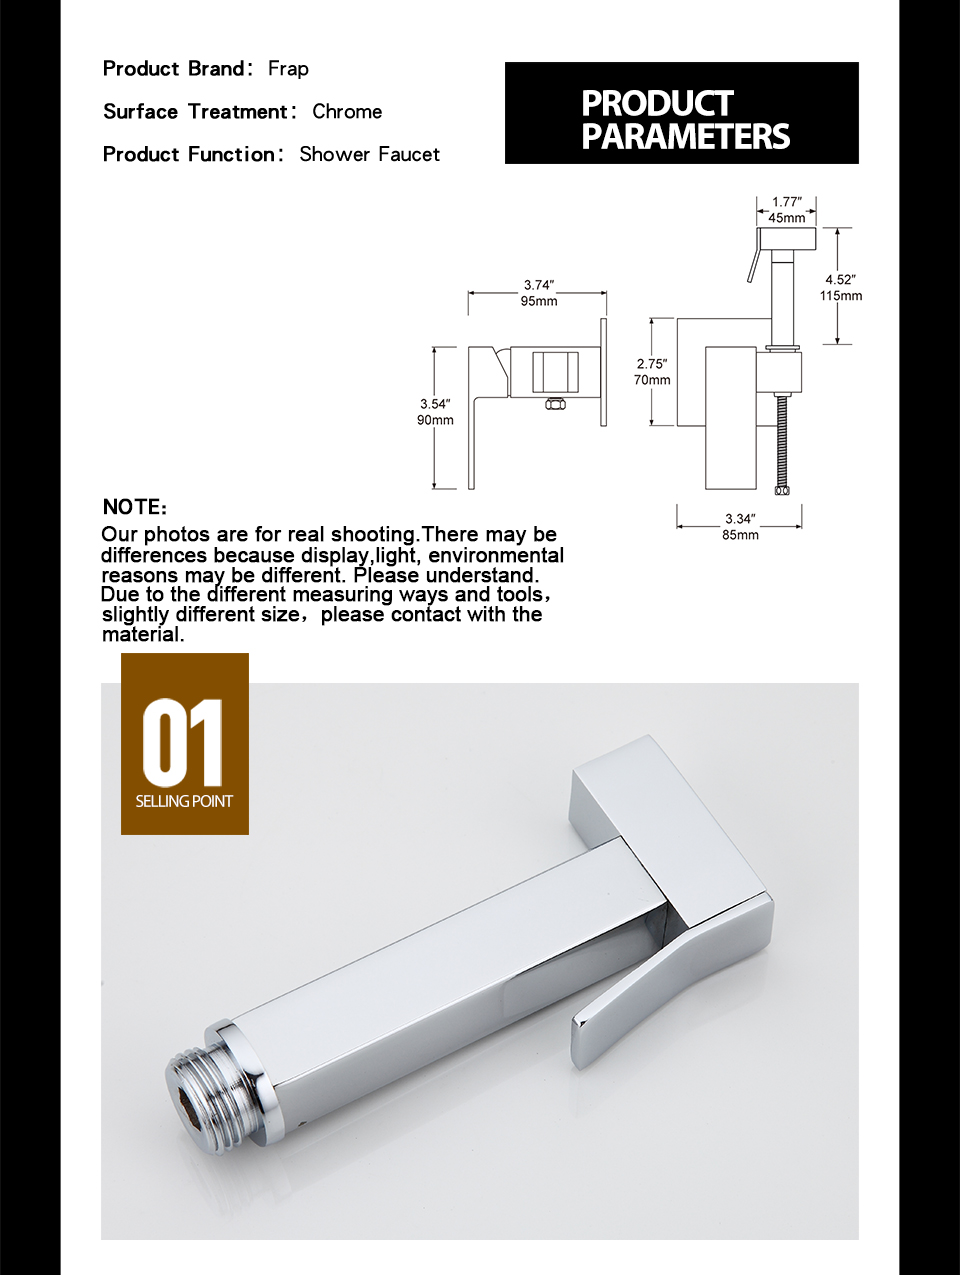 HTB1shCFlIIrBKNjSZK9q6ygoVXam FRAP Chrome Brass Bidets Bathroom Toilet Sprayer Muslim Shower Bidet Tap Hygienic Shower Wall Mount Shattafs Faucets F7506